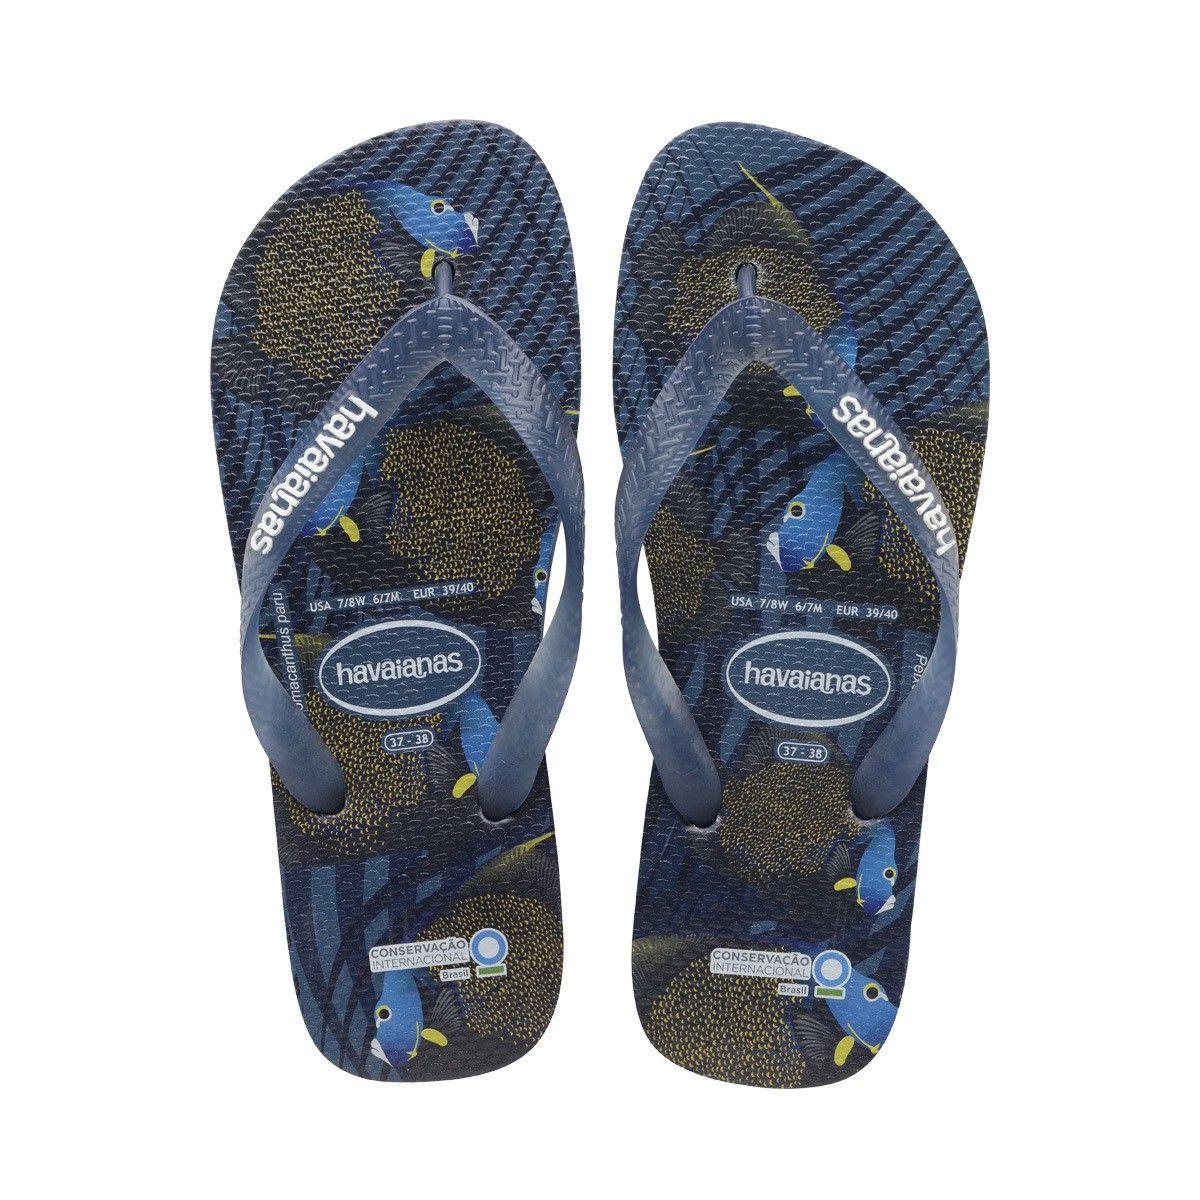 8333fcb7b HAVAIANAS CONSERVATION INTERNATIONAL INDIGO BLUE - MEN.  havaianas  shoes   all